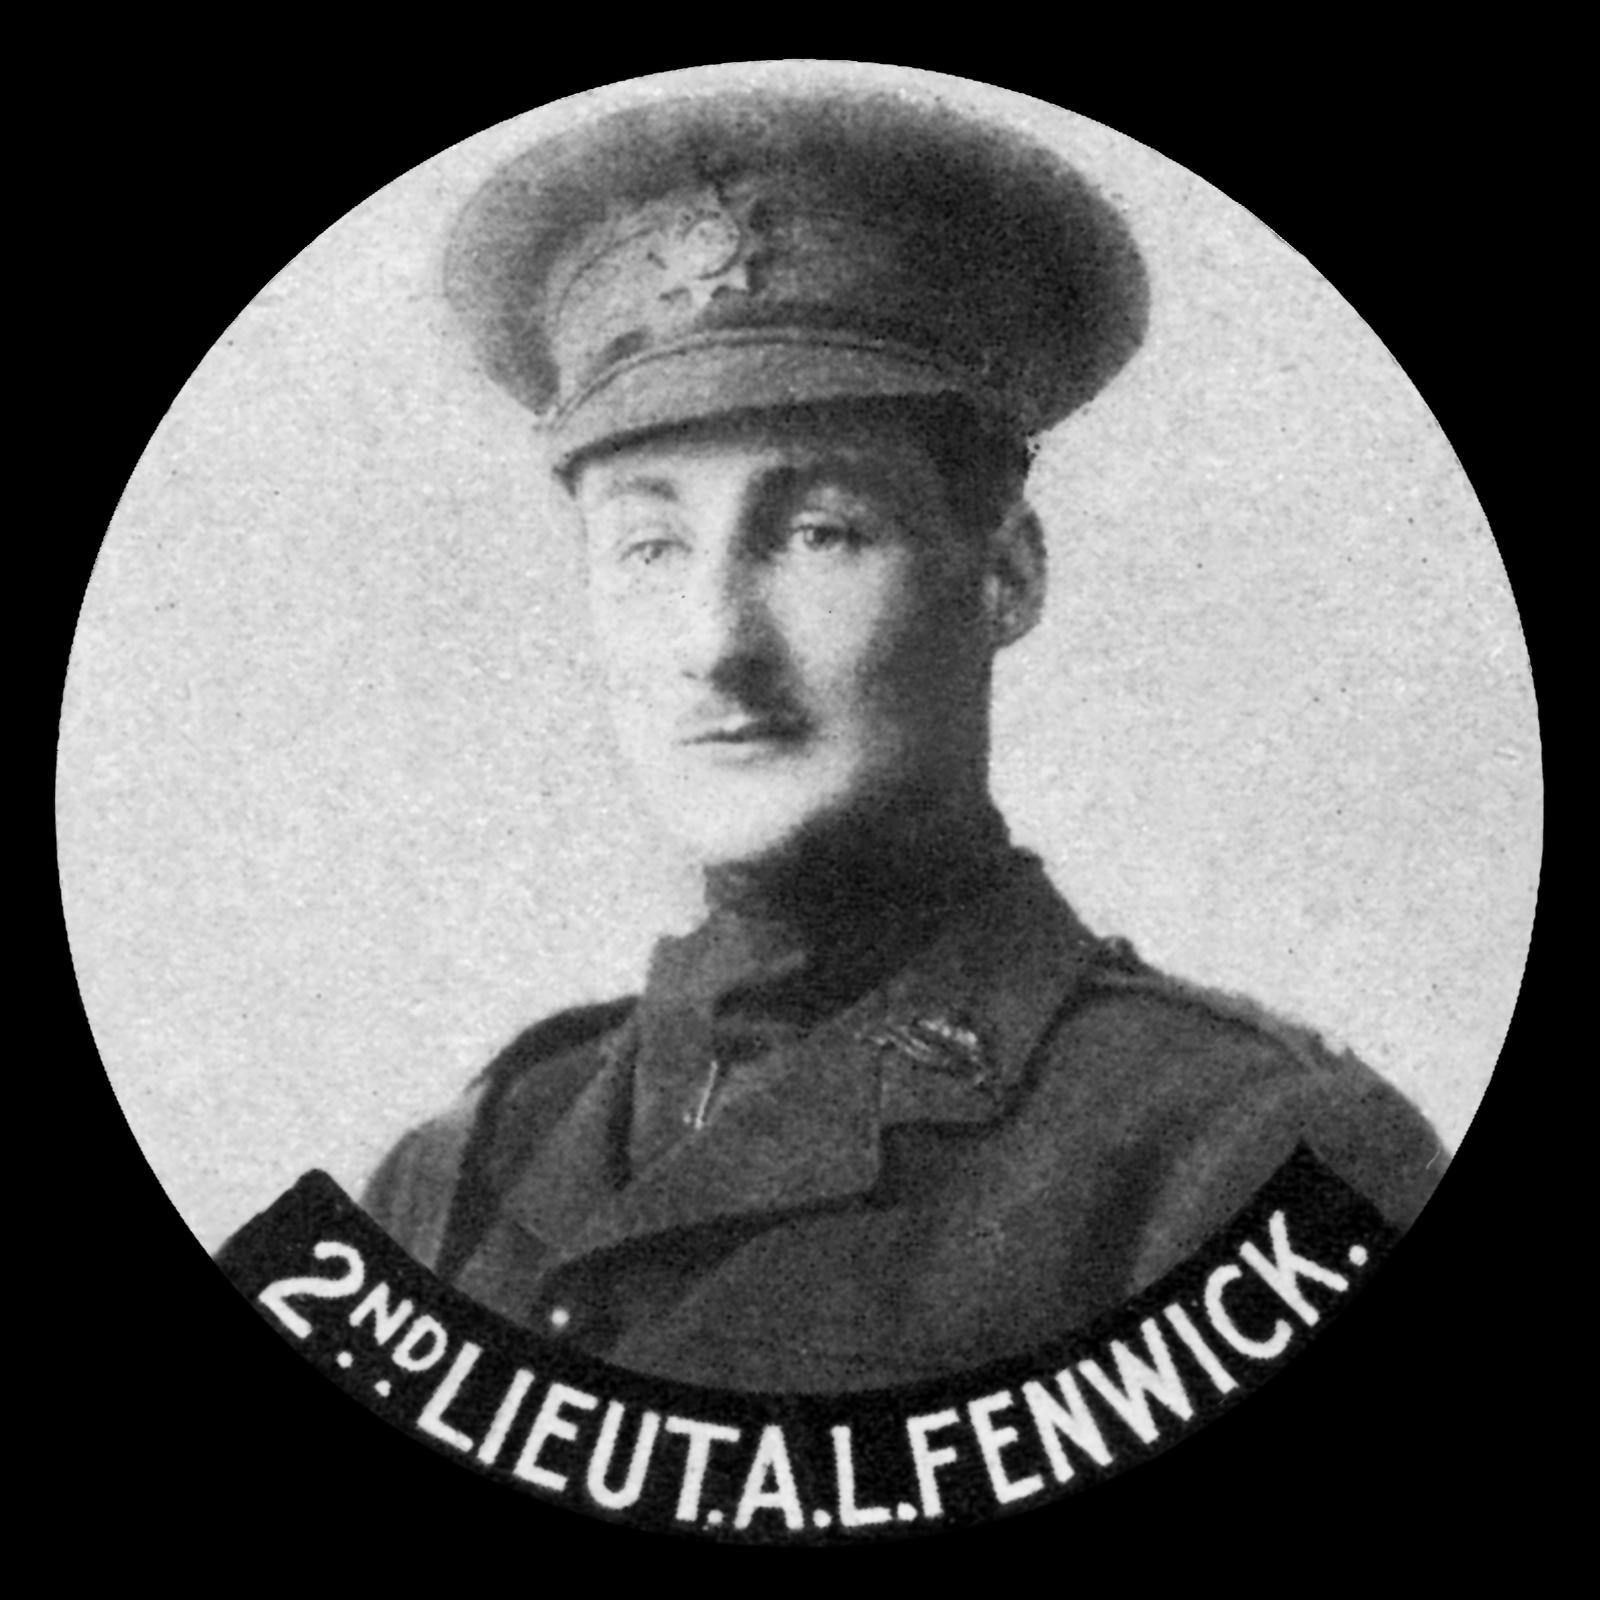 FENWICK Anthony Lional